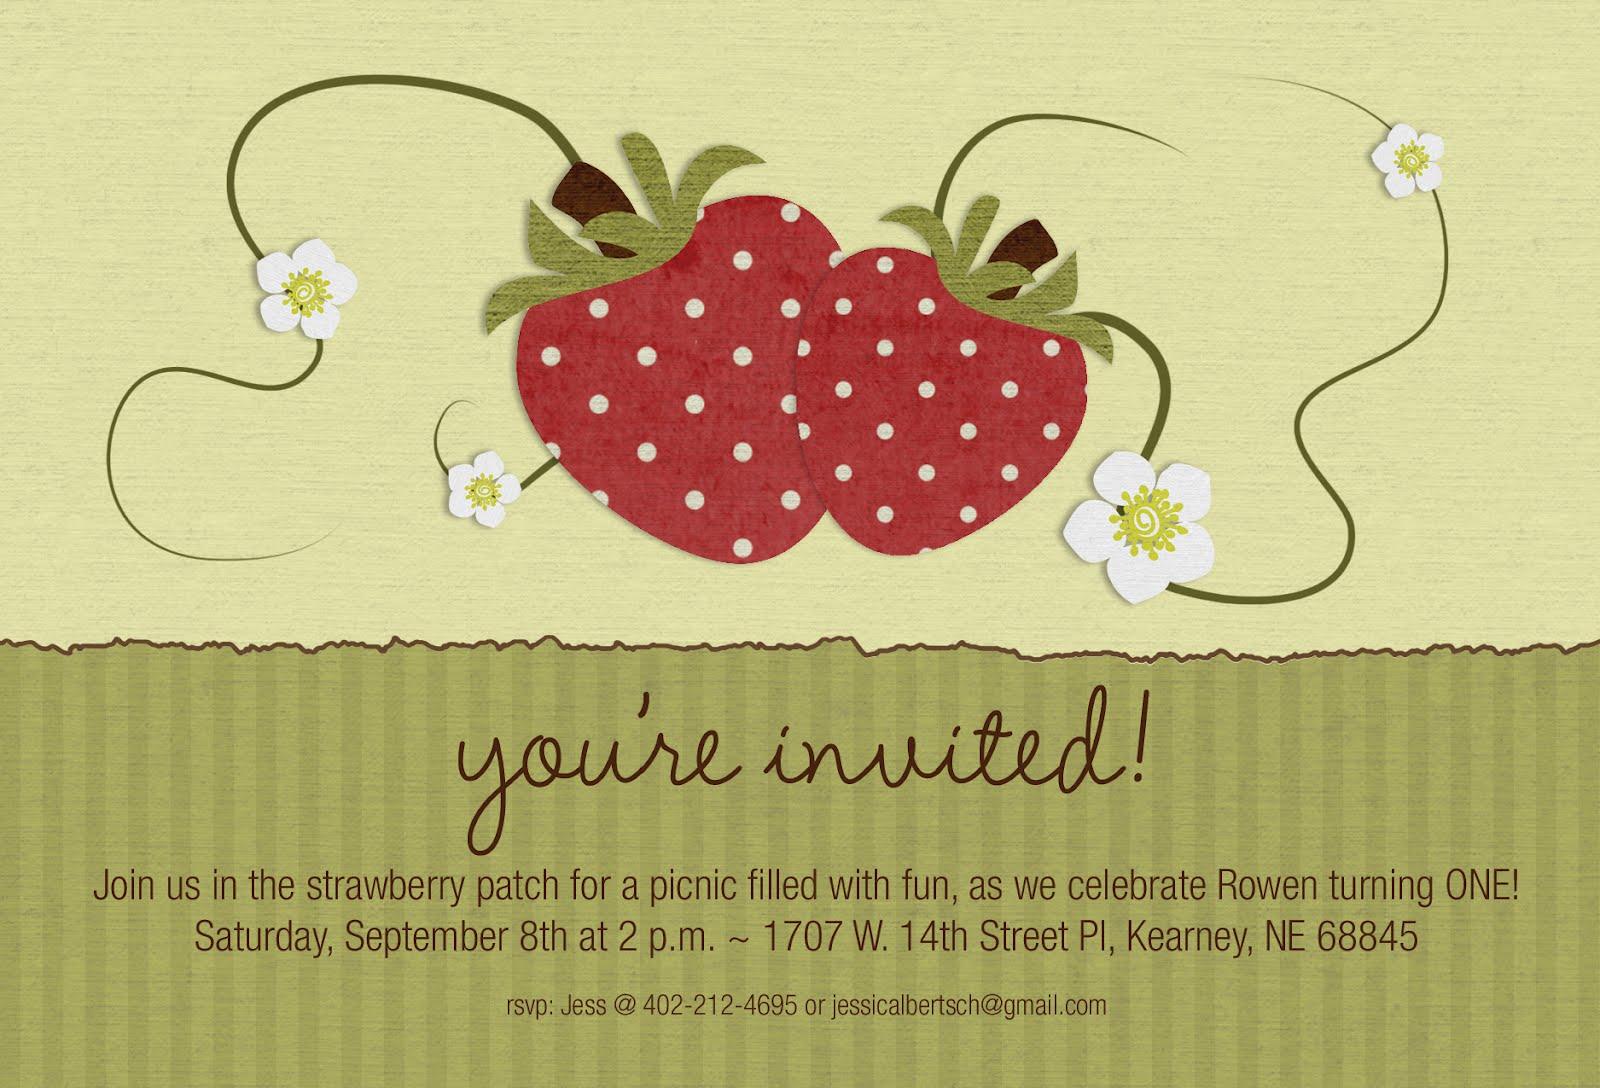 Strawberry Patch Picnic Invitations ~ 1st Birthday | Pixel Pro